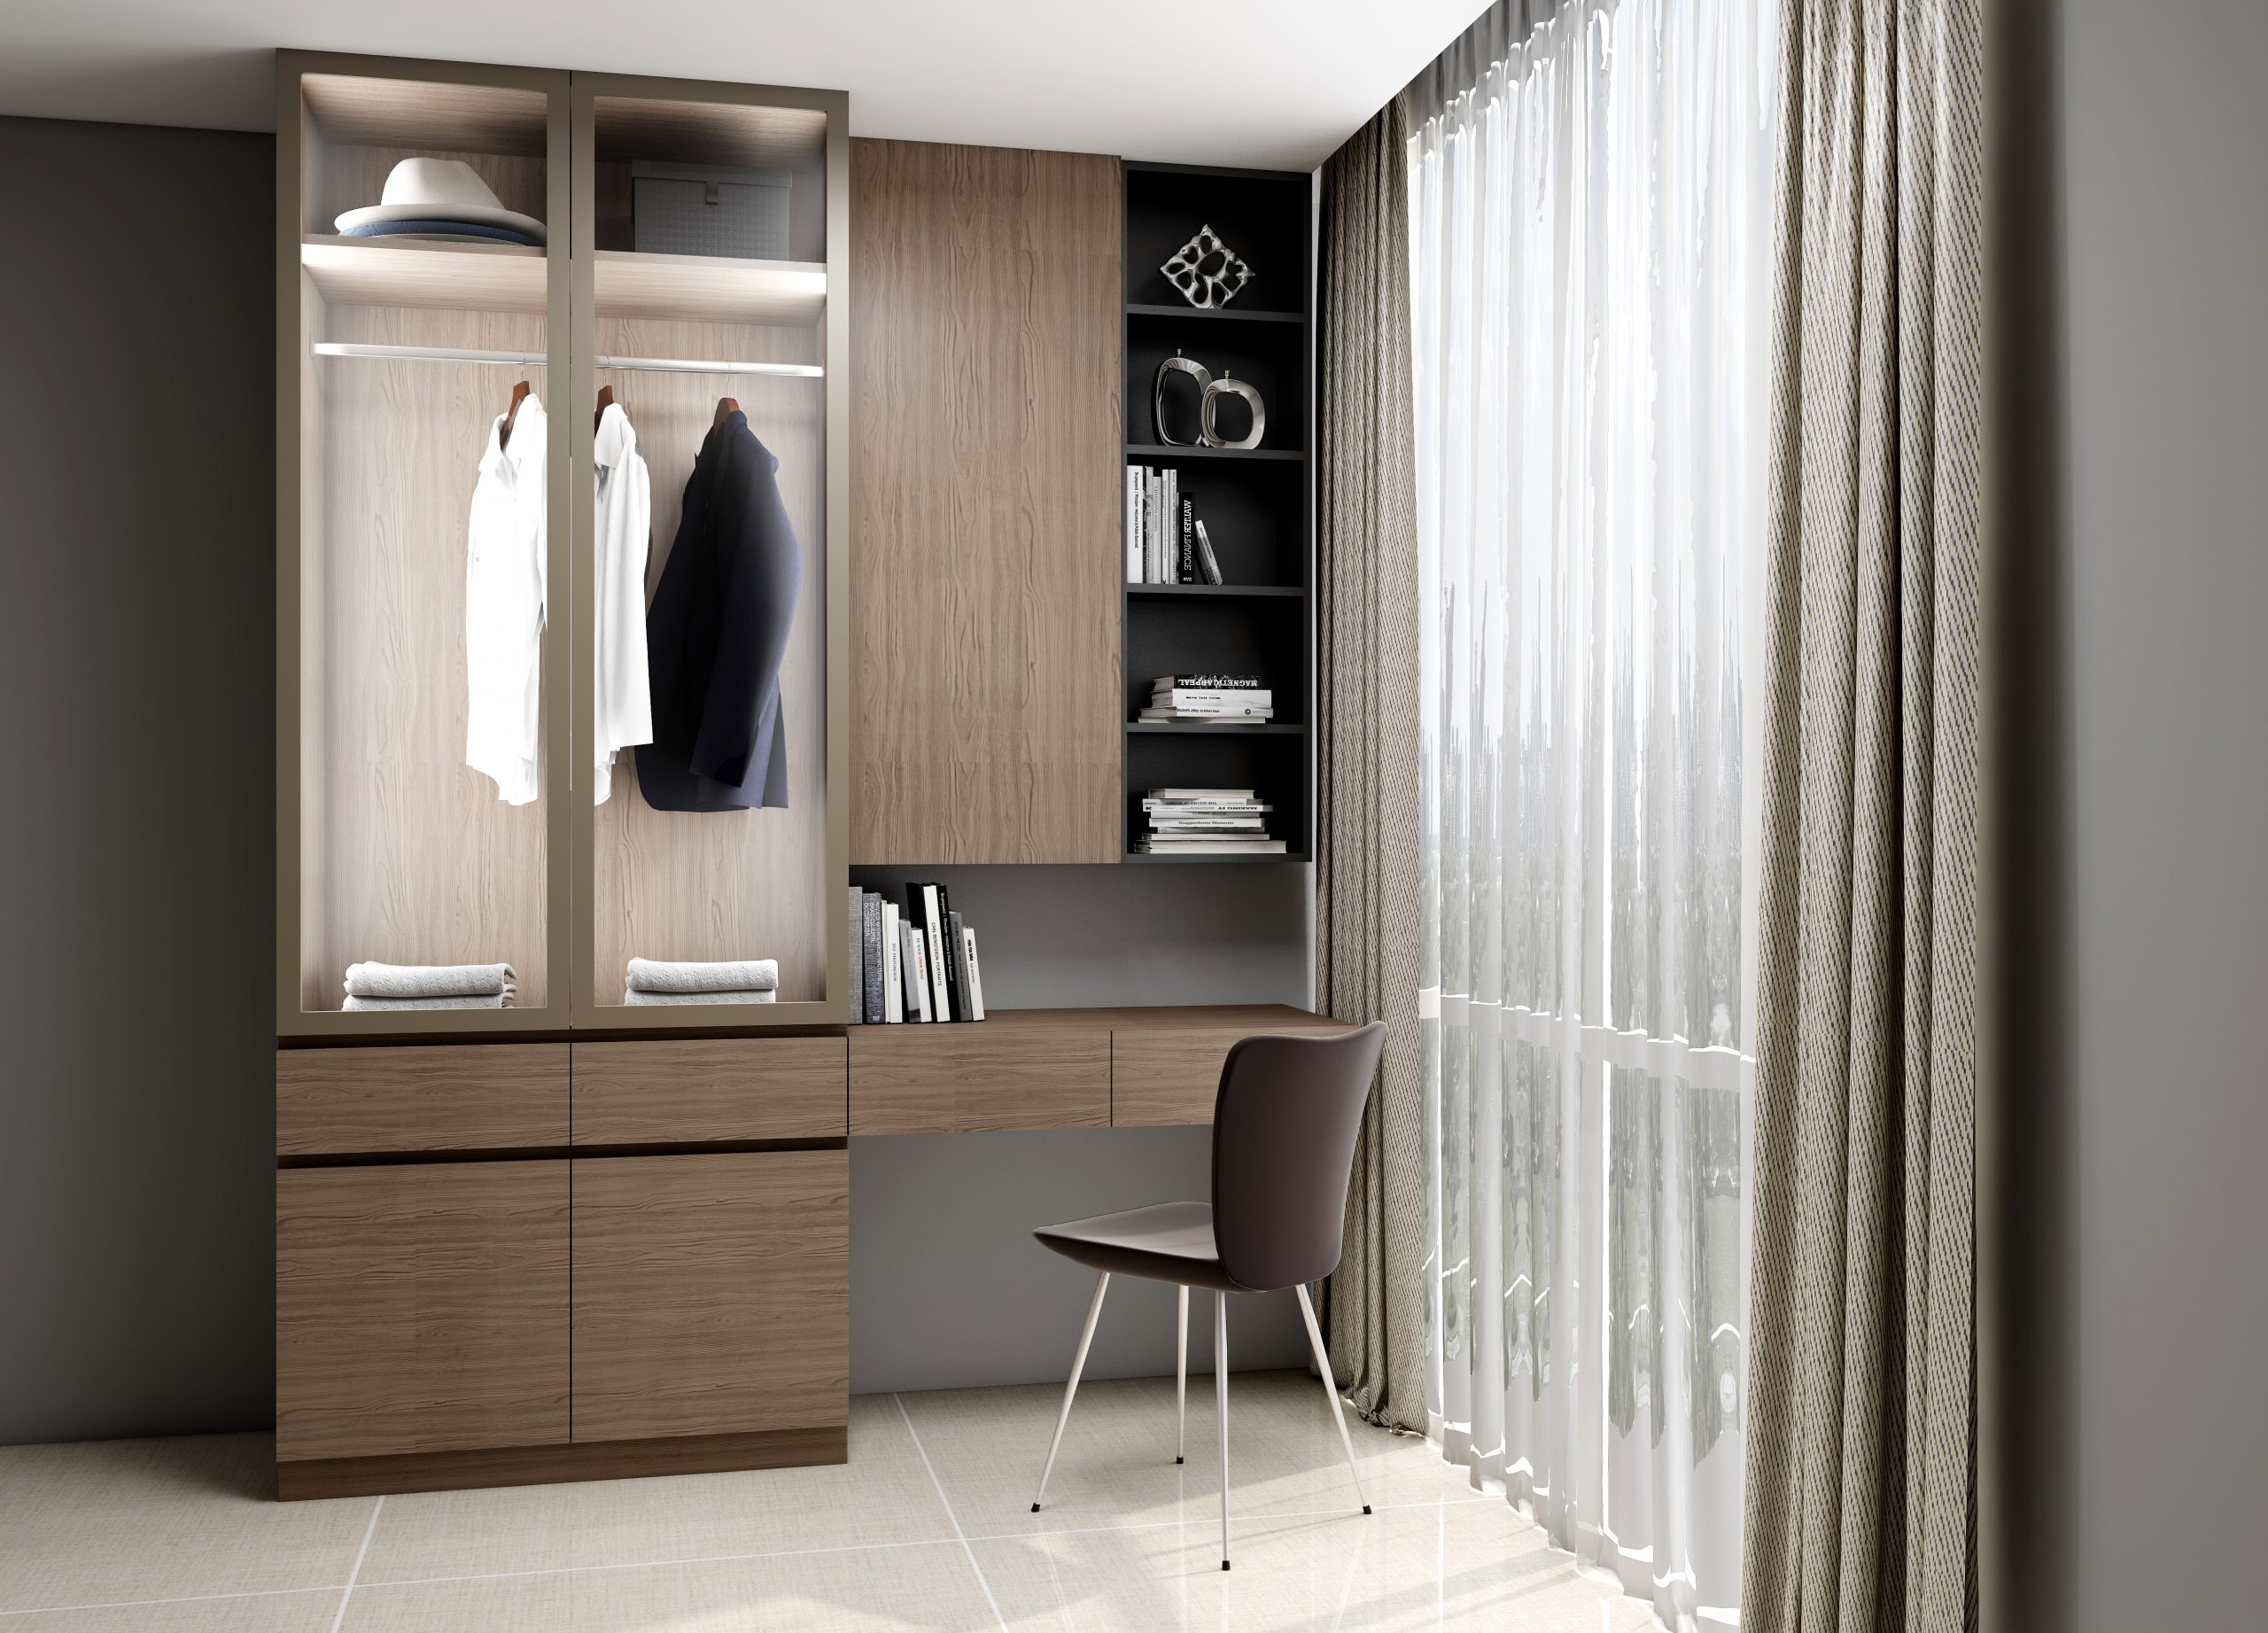 Study office finished in Dark Walnut Woodgrain, clear glass and Graphite matt